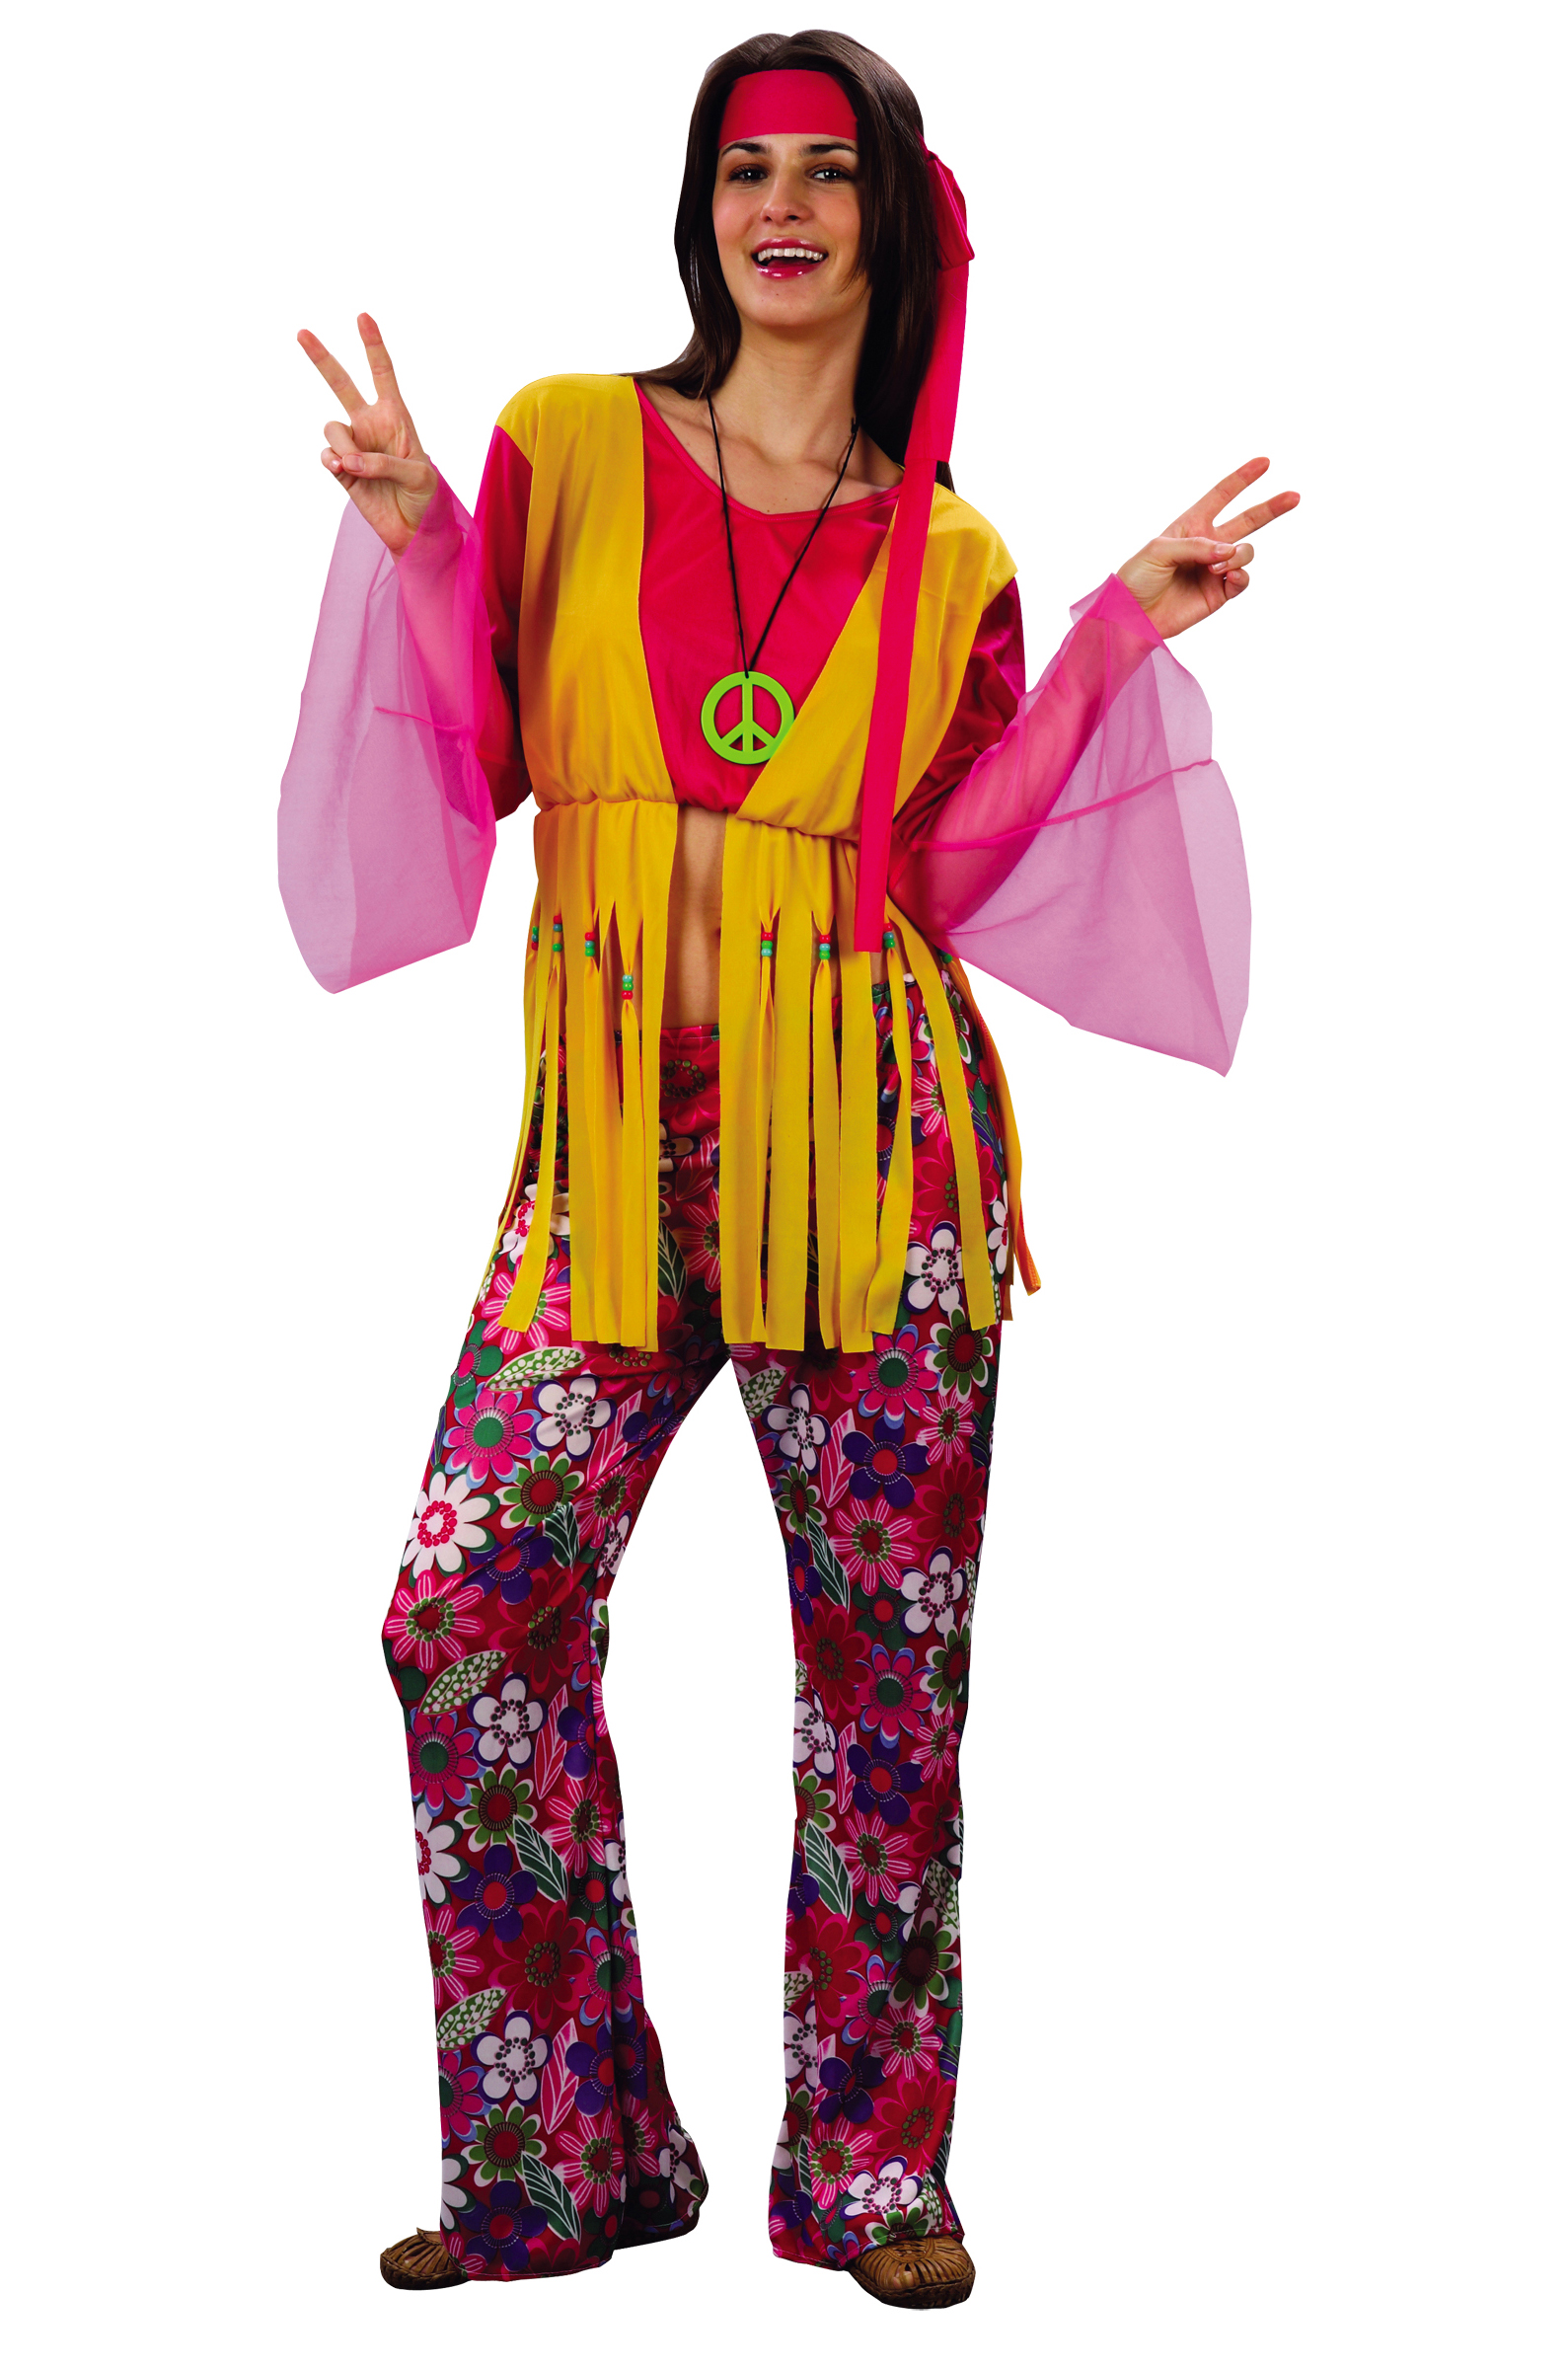 Костюм Девочки хиппи (44-48) костюм цветочной хиппи 48